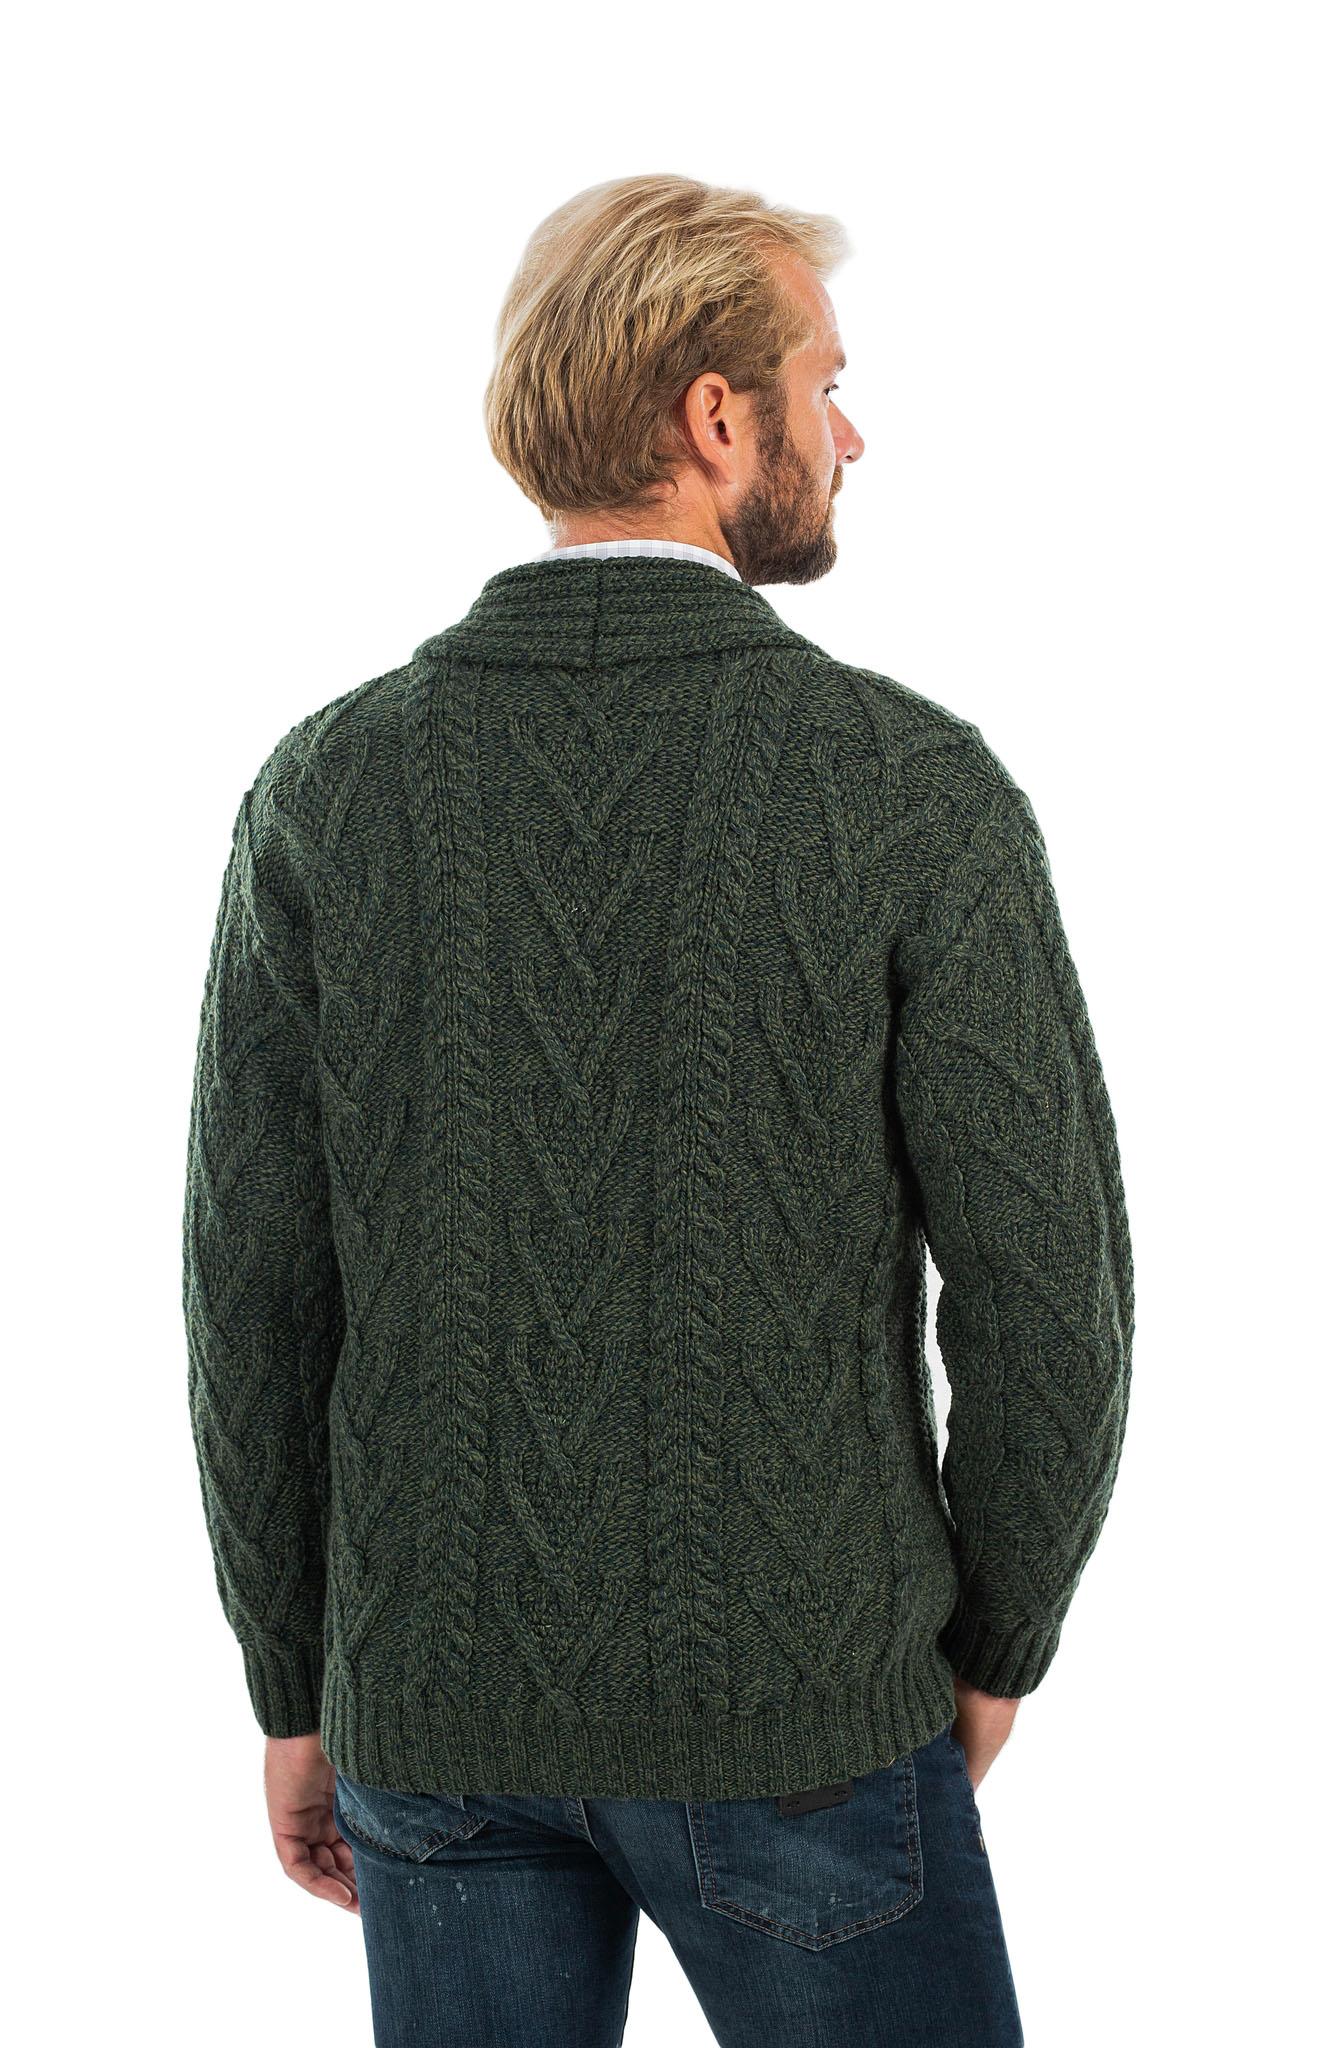 SAOL-Mens-Irish-Merino-Wool-Cardigan-Shawl-Collar-Front-Pockets-Aran-Cable-Knit thumbnail 9